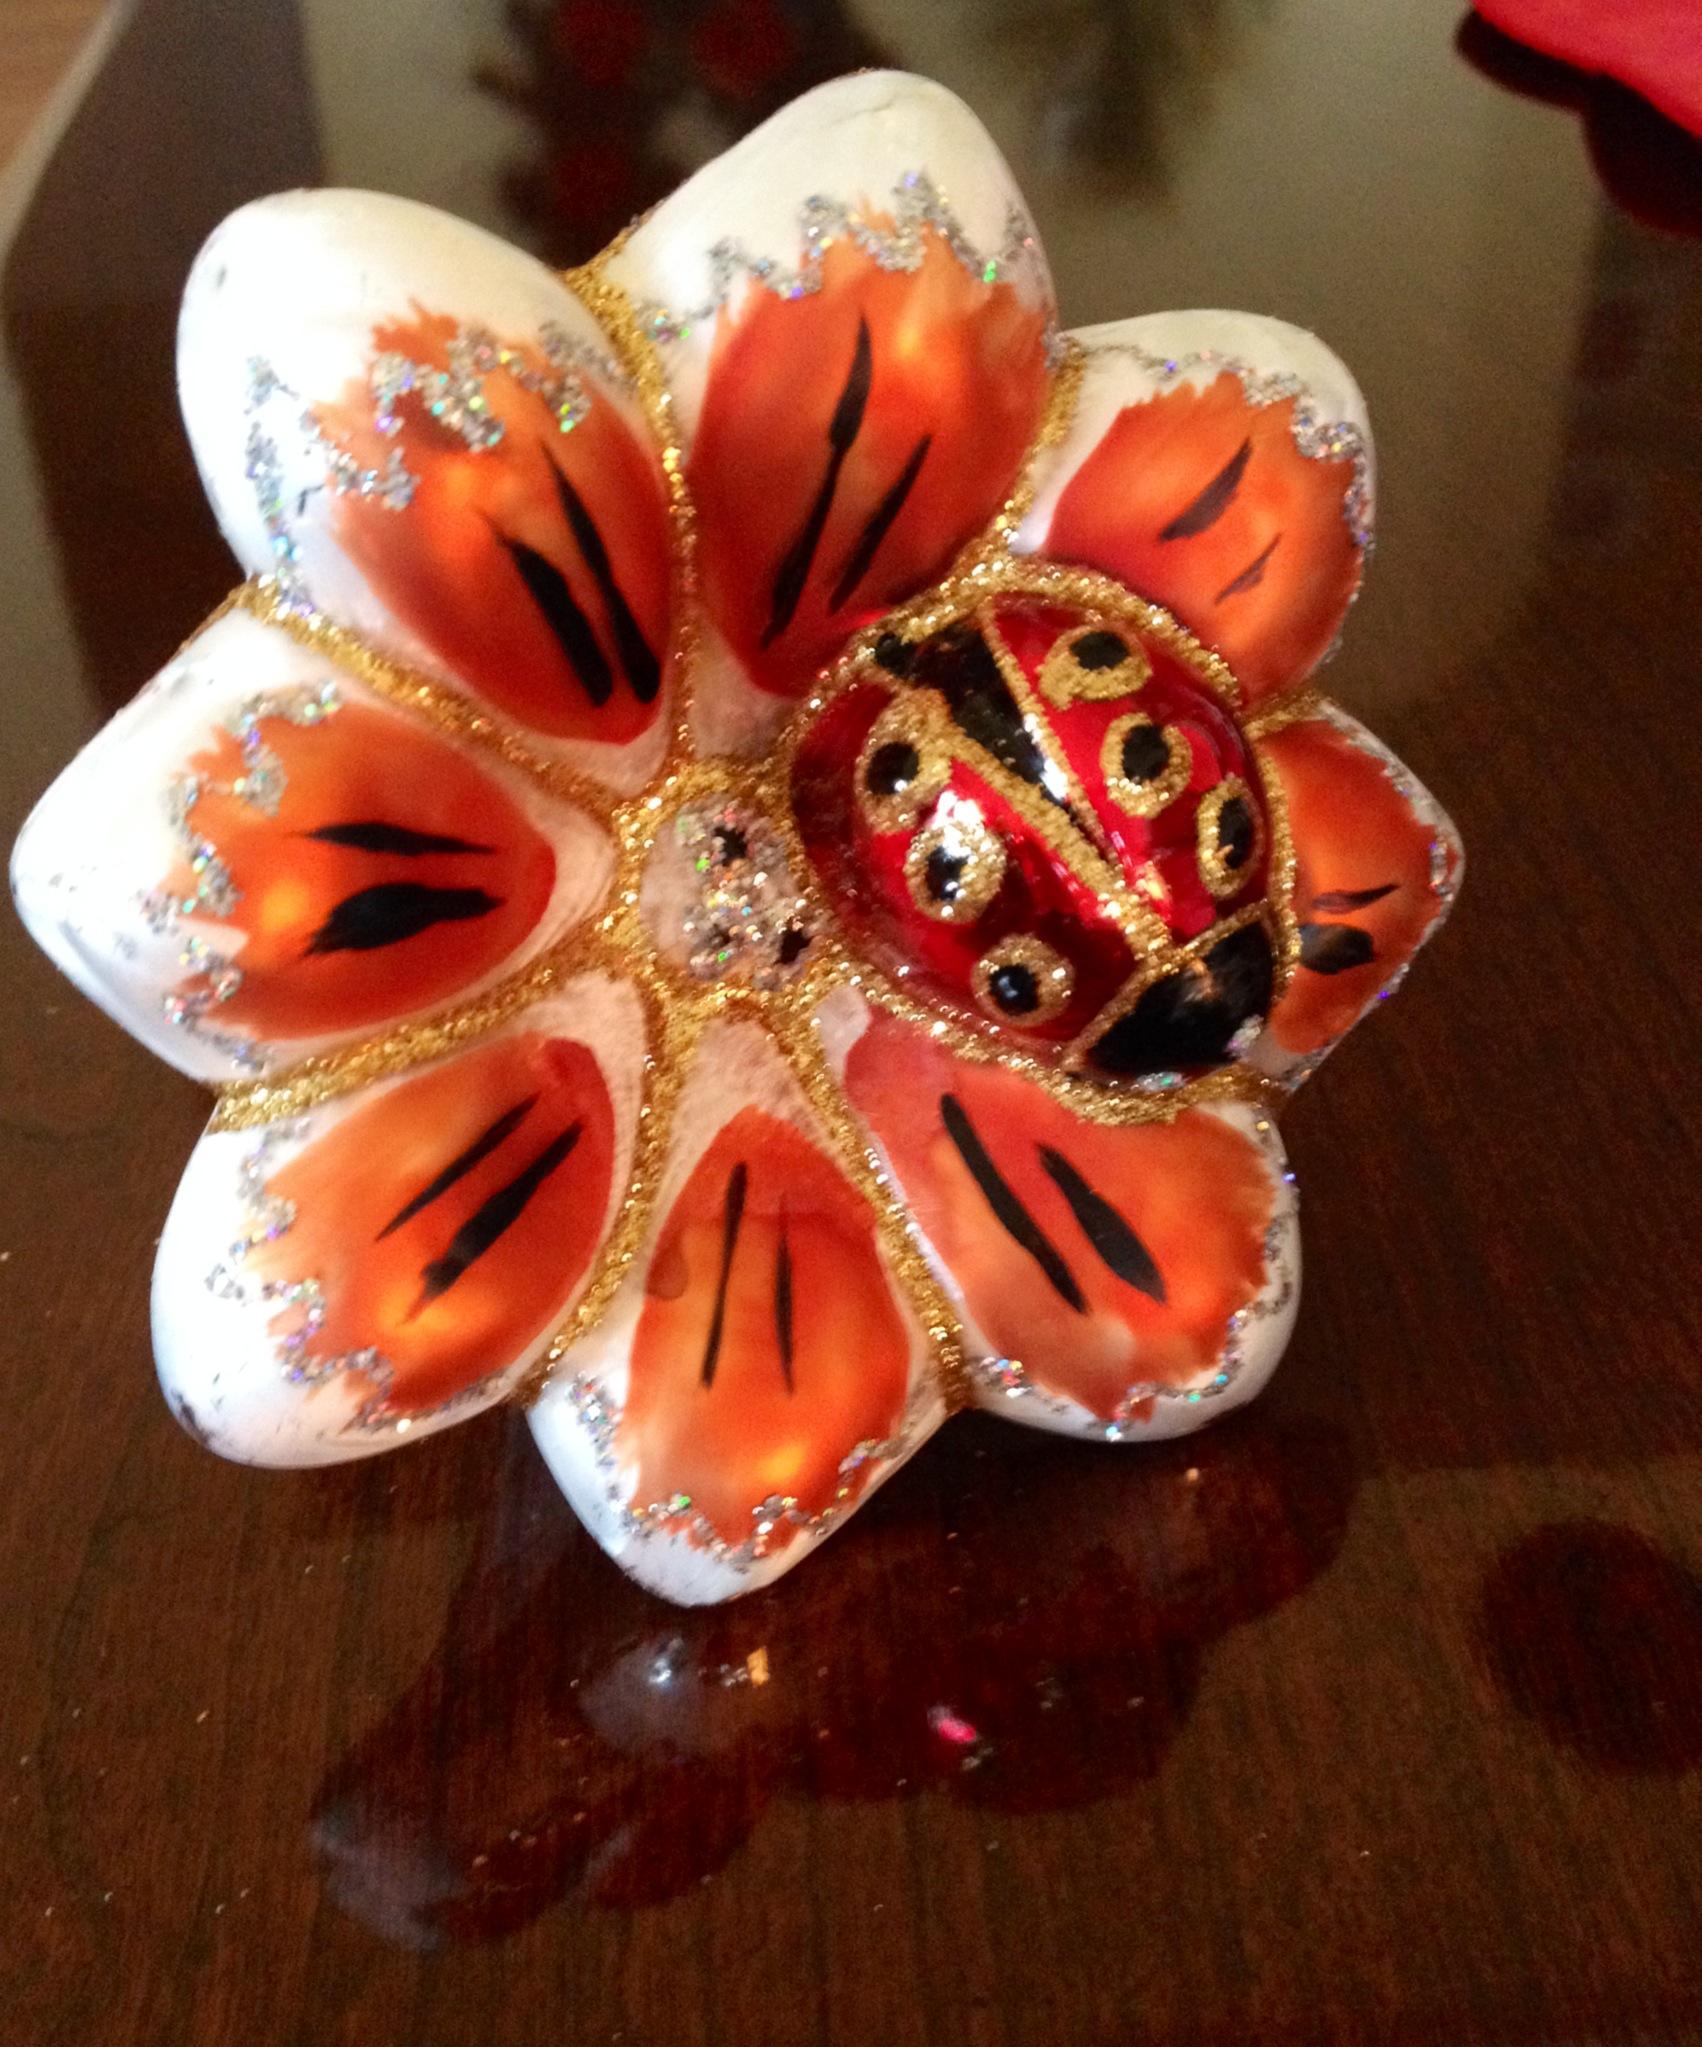 Ladybug ornaments - Lucky Ladybug Christmas Ornament An Ornamental Christmas Tradition The Adventure Is Afoot